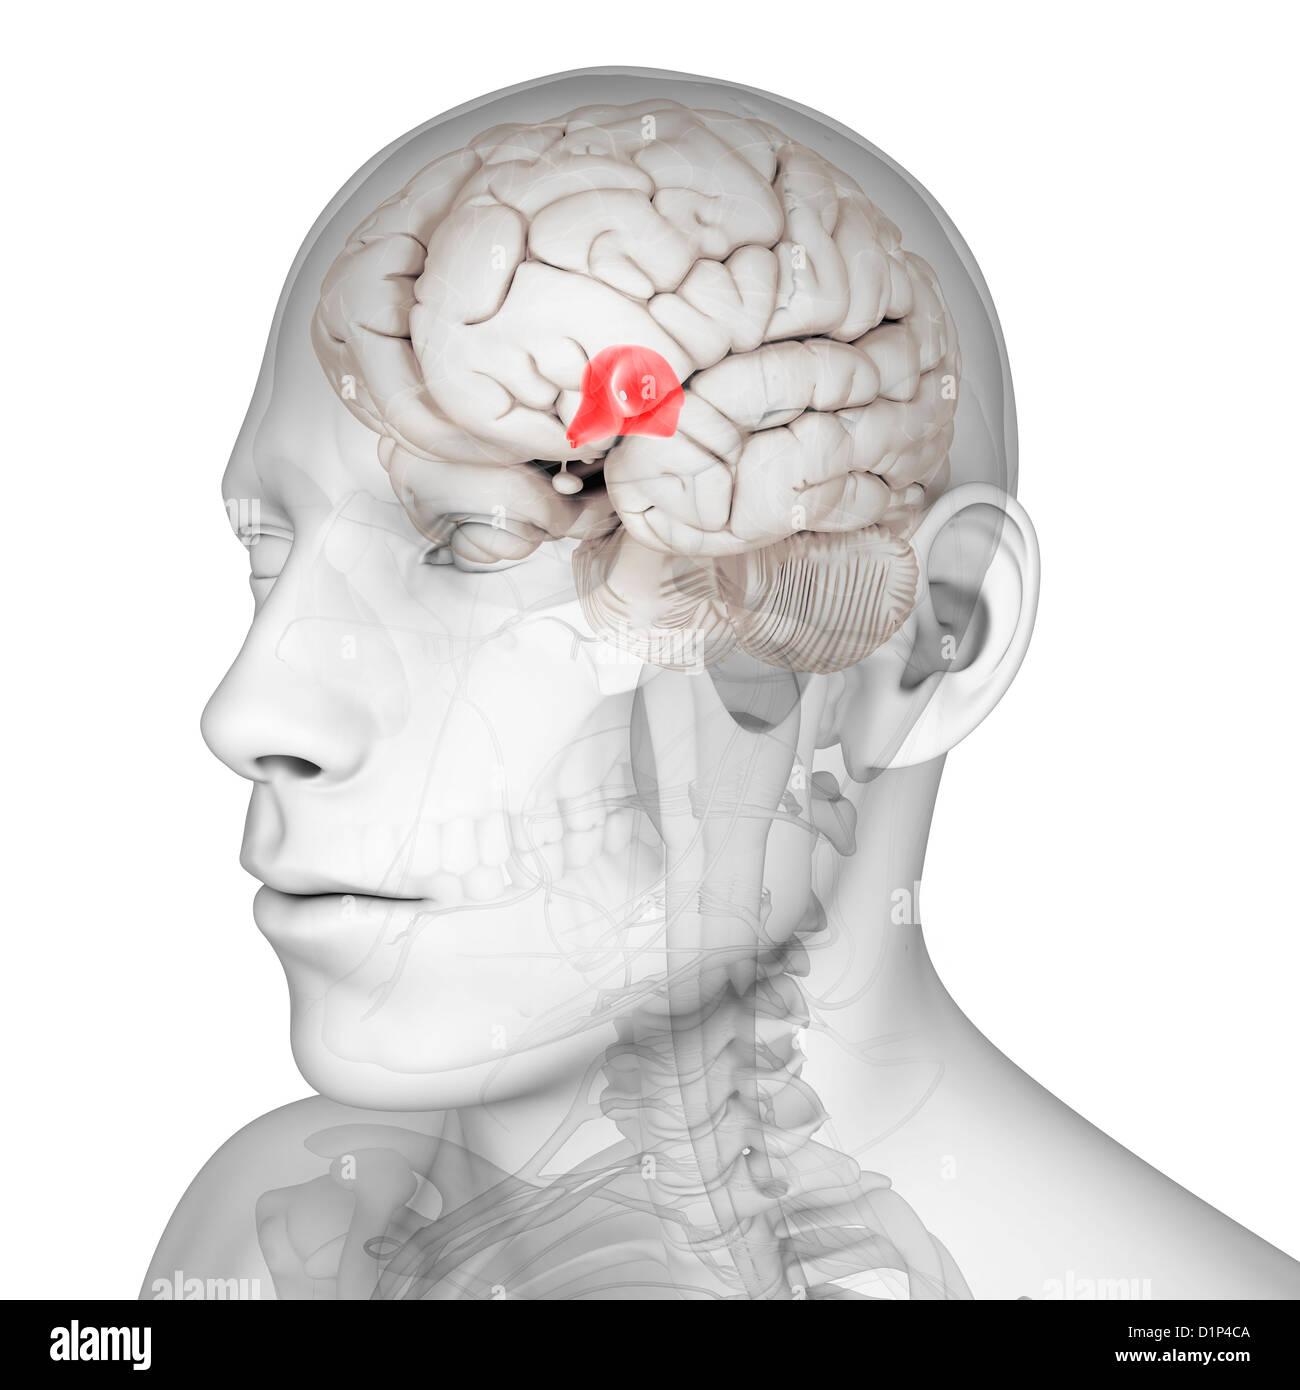 Third ventricle, artwork - Stock Image